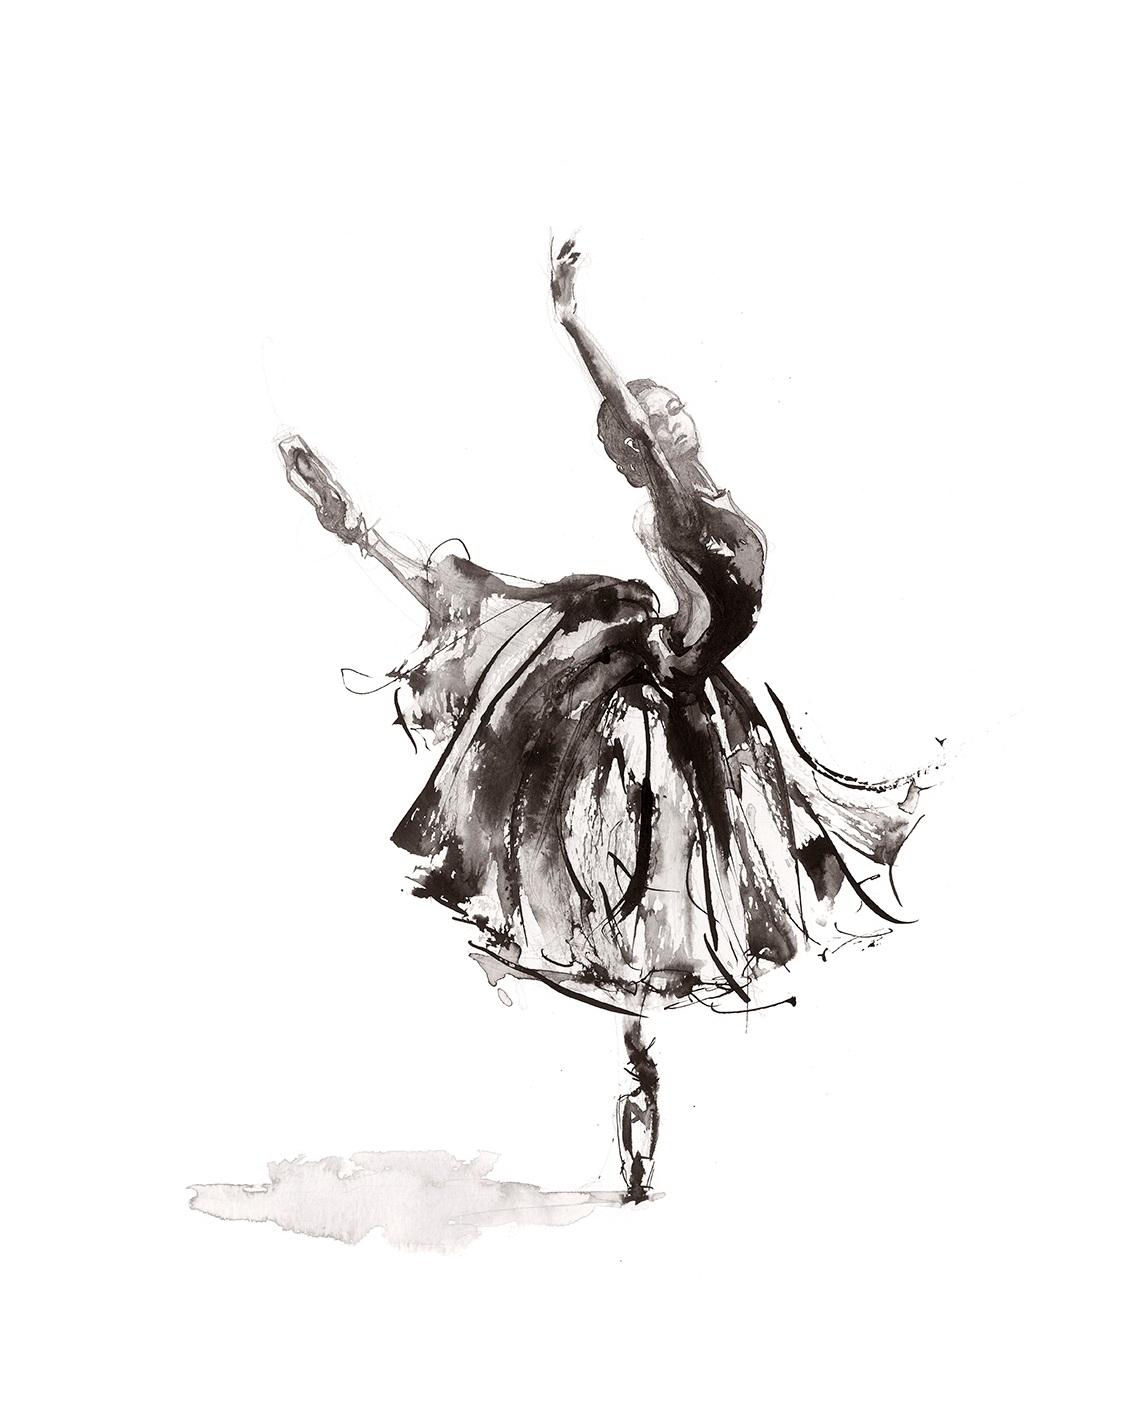 'Symphony'.  Fine Art Print by Artist, Dana Trijbetz.  Ballet Dancers Collection.  Original Ink Painting made as a Giclée Print on 100% Cotton Paper.